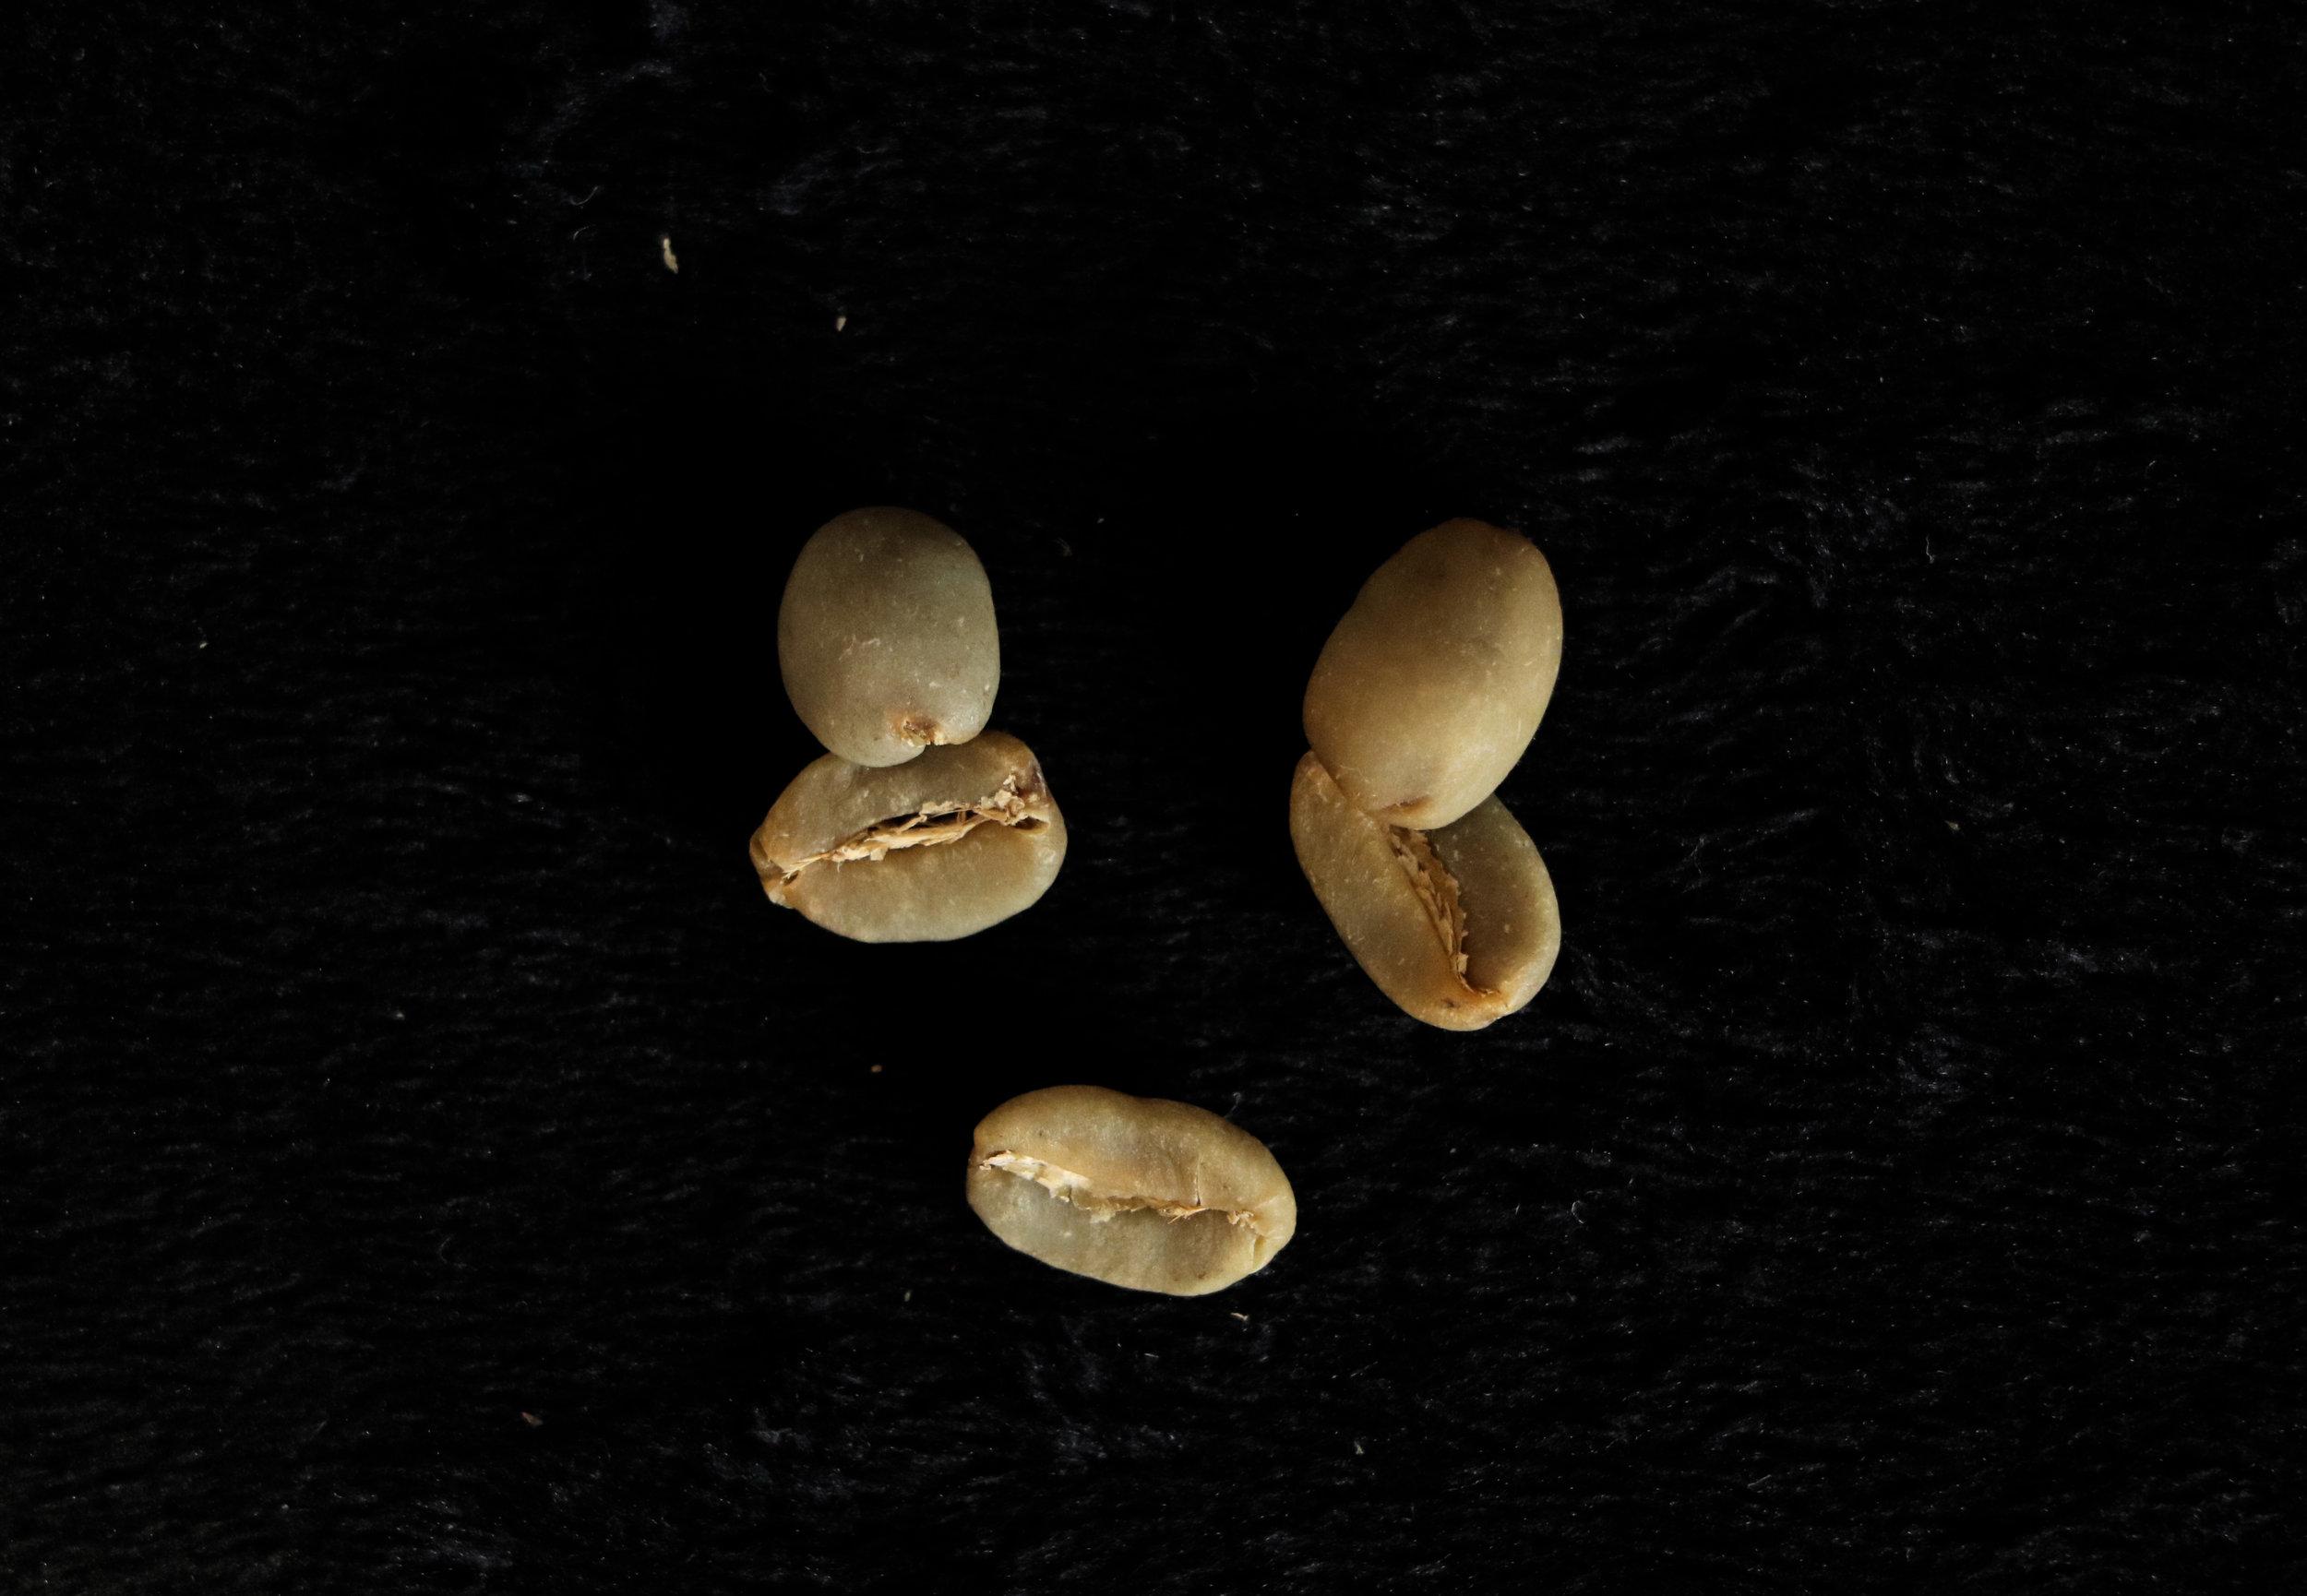 Dead beans